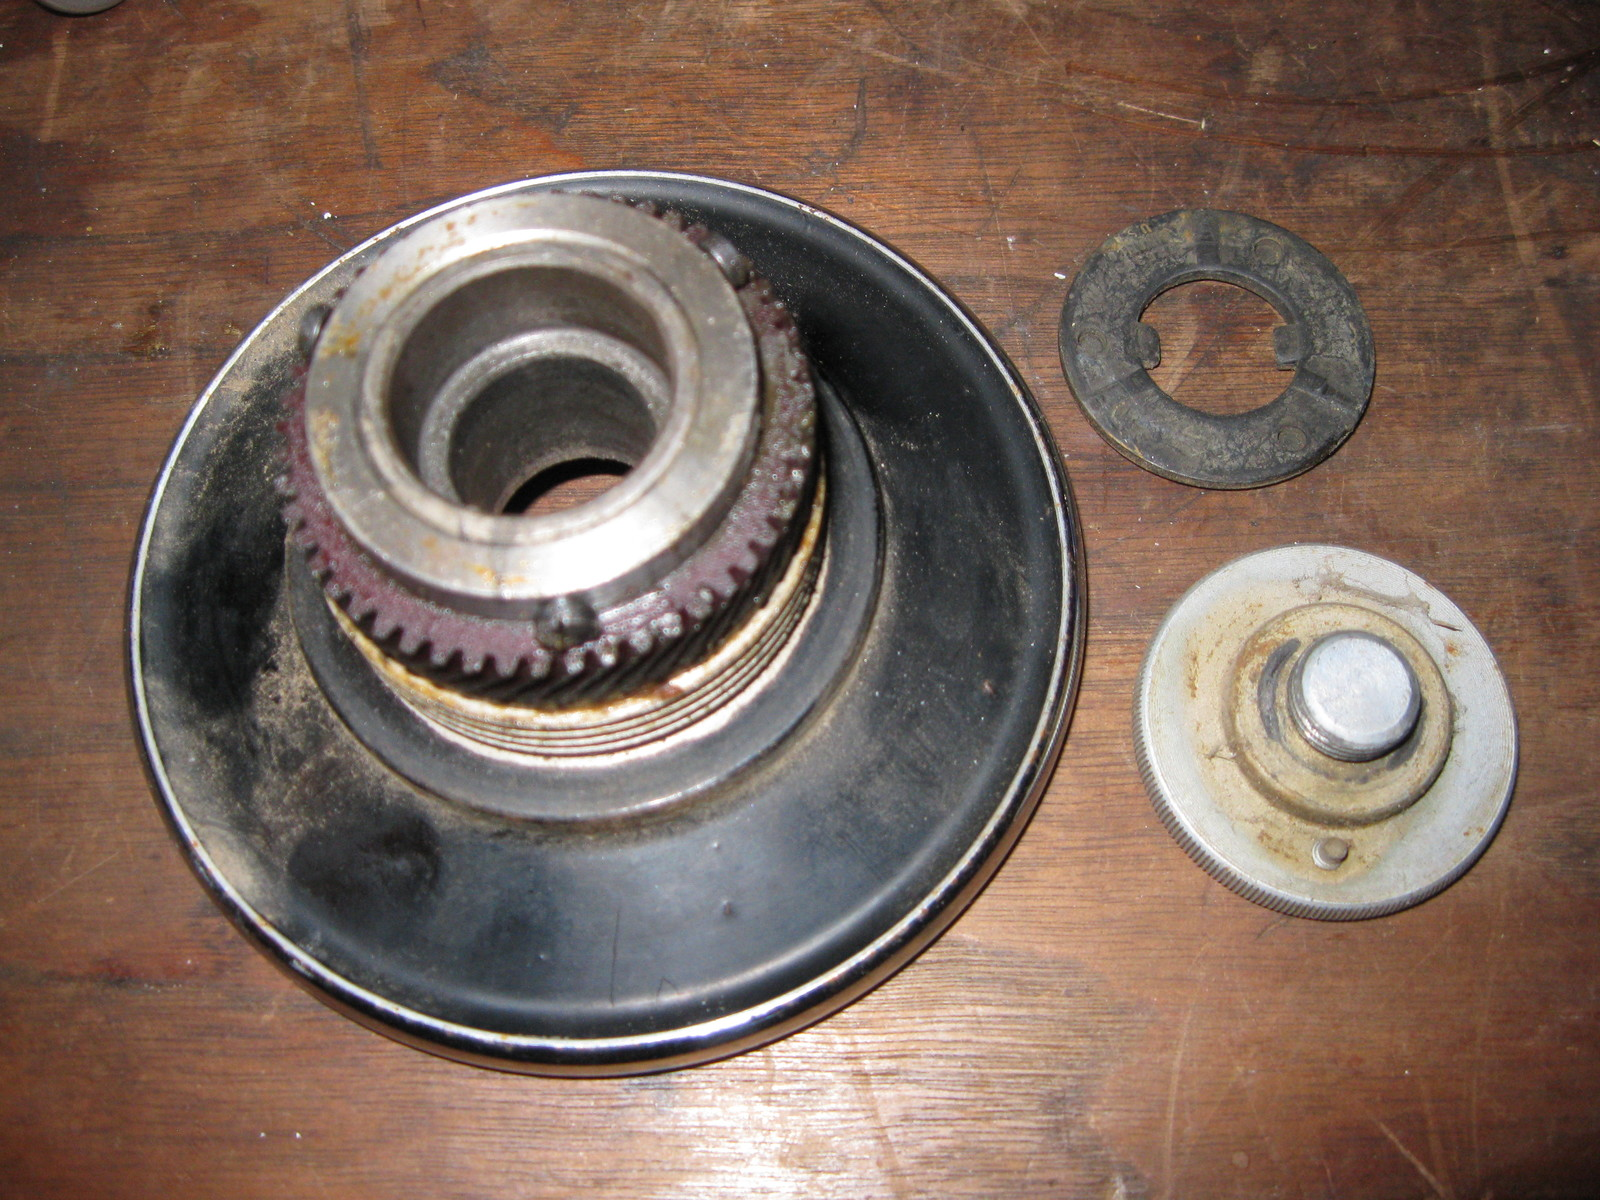 Vintage Singer 15-91 Balance Wheel w/ Gears & Stop Motion Knob image 3